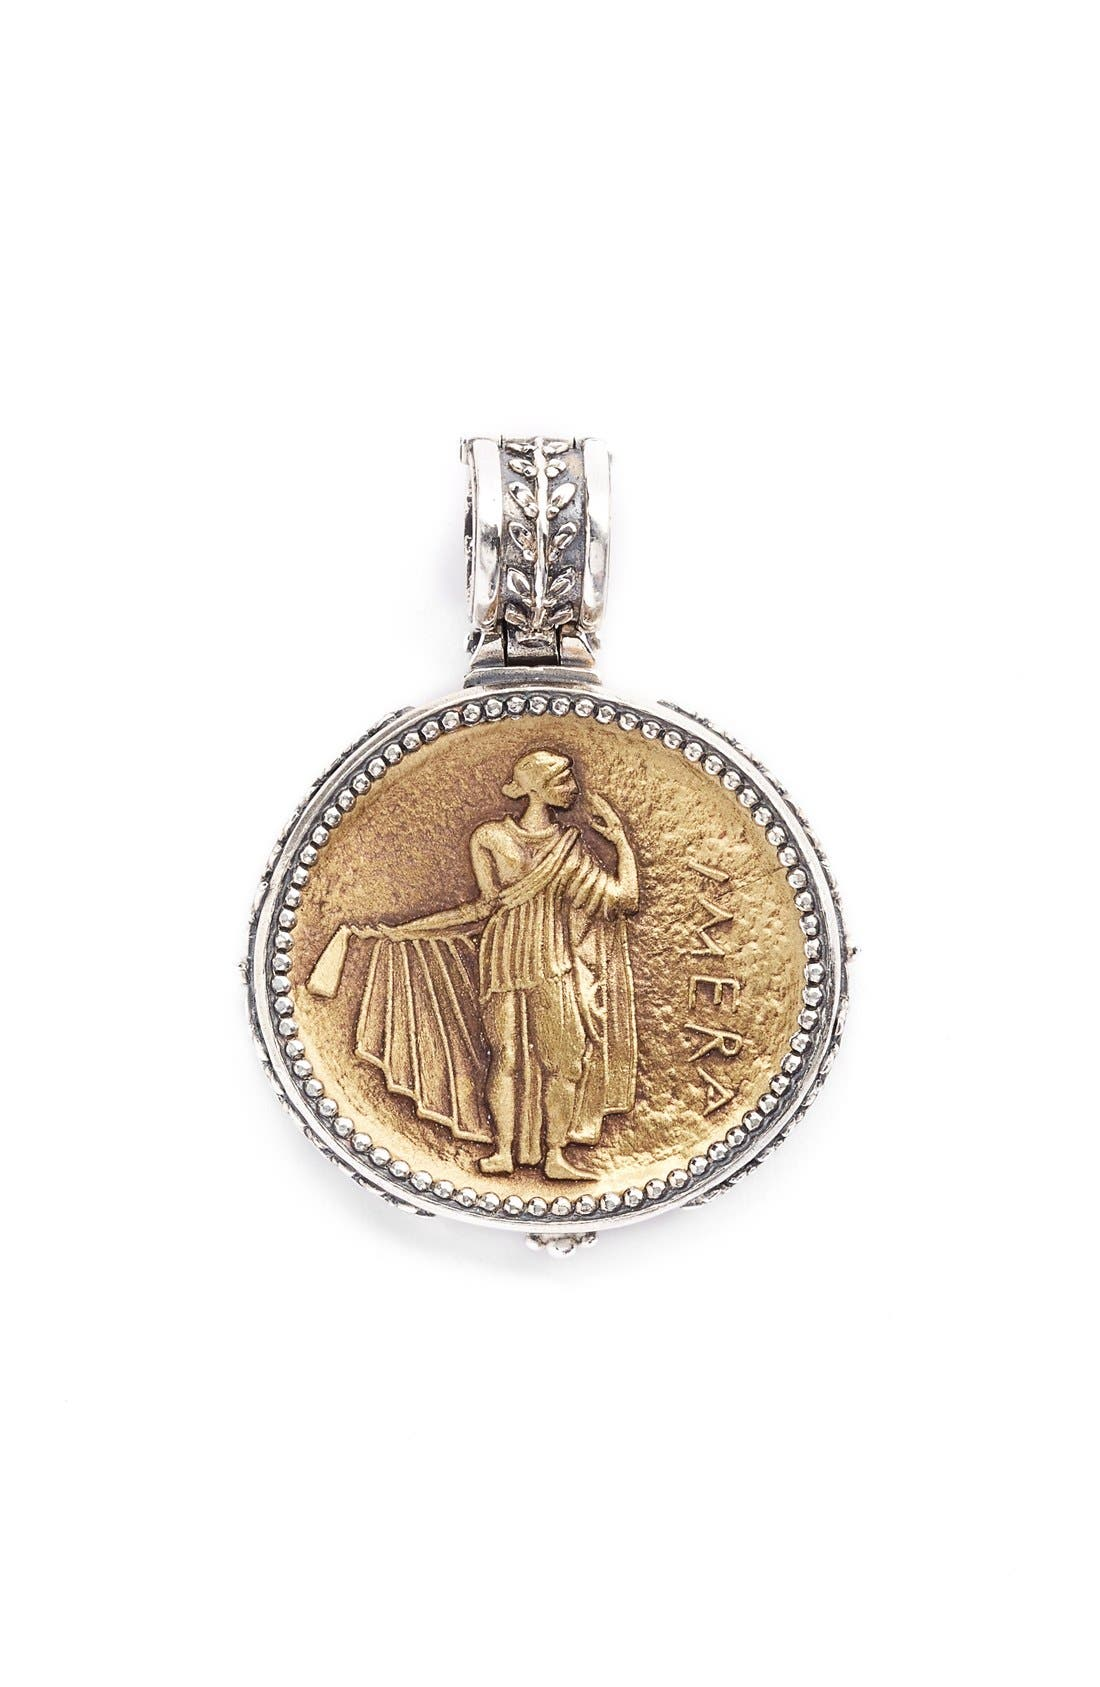 Alternate Image 1 Selected - Konstantino 'Pelopidas' Coin Pendant